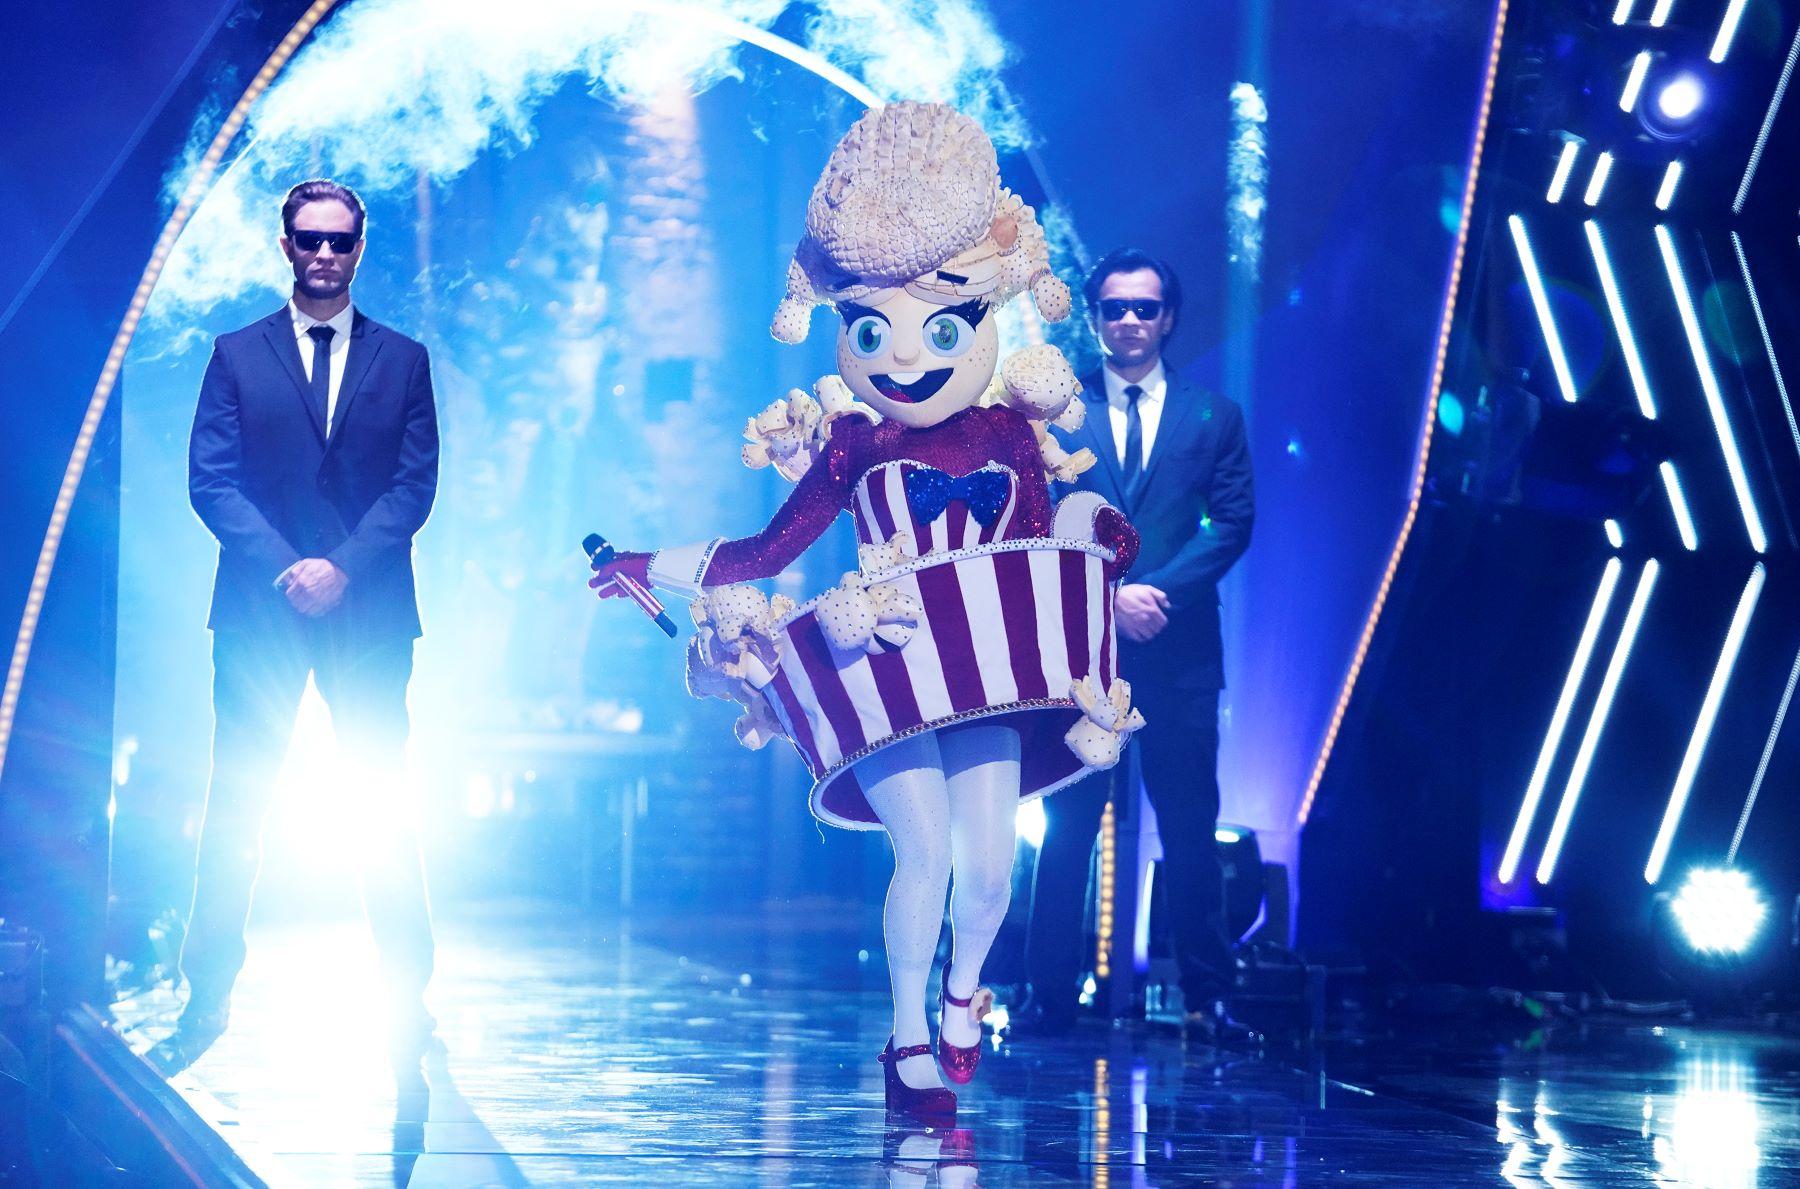 The Popcorn on 'The Masked Singer' Season 4